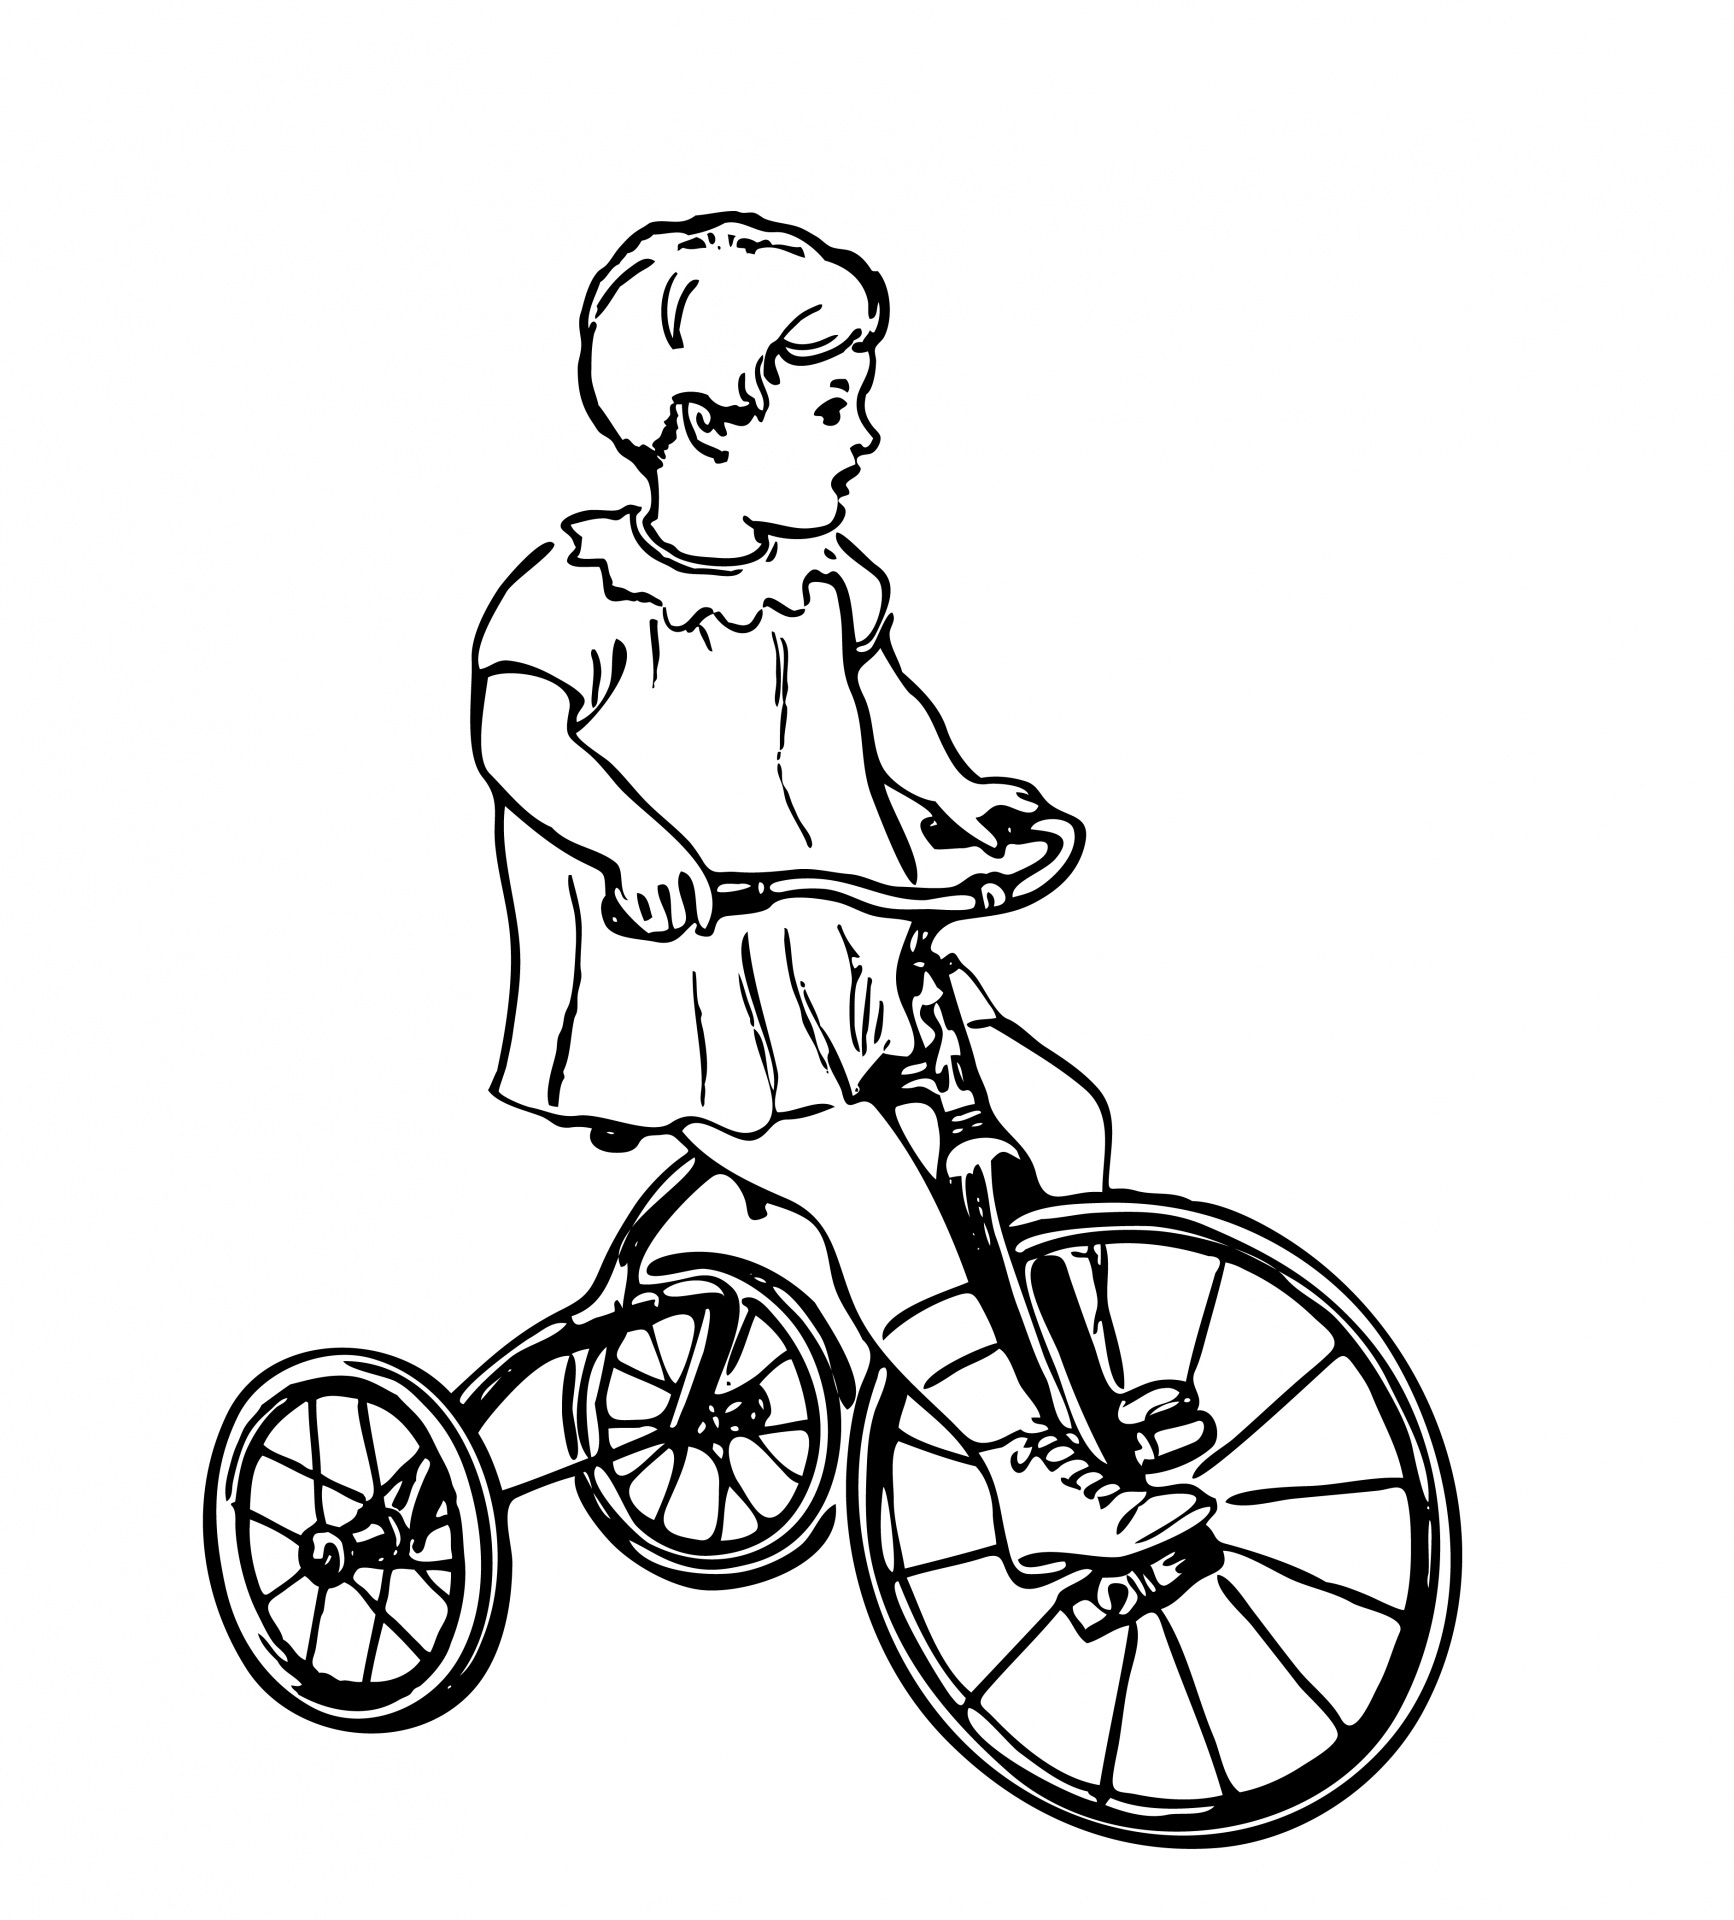 Child Riding Trike Illustration Free Stock Photo